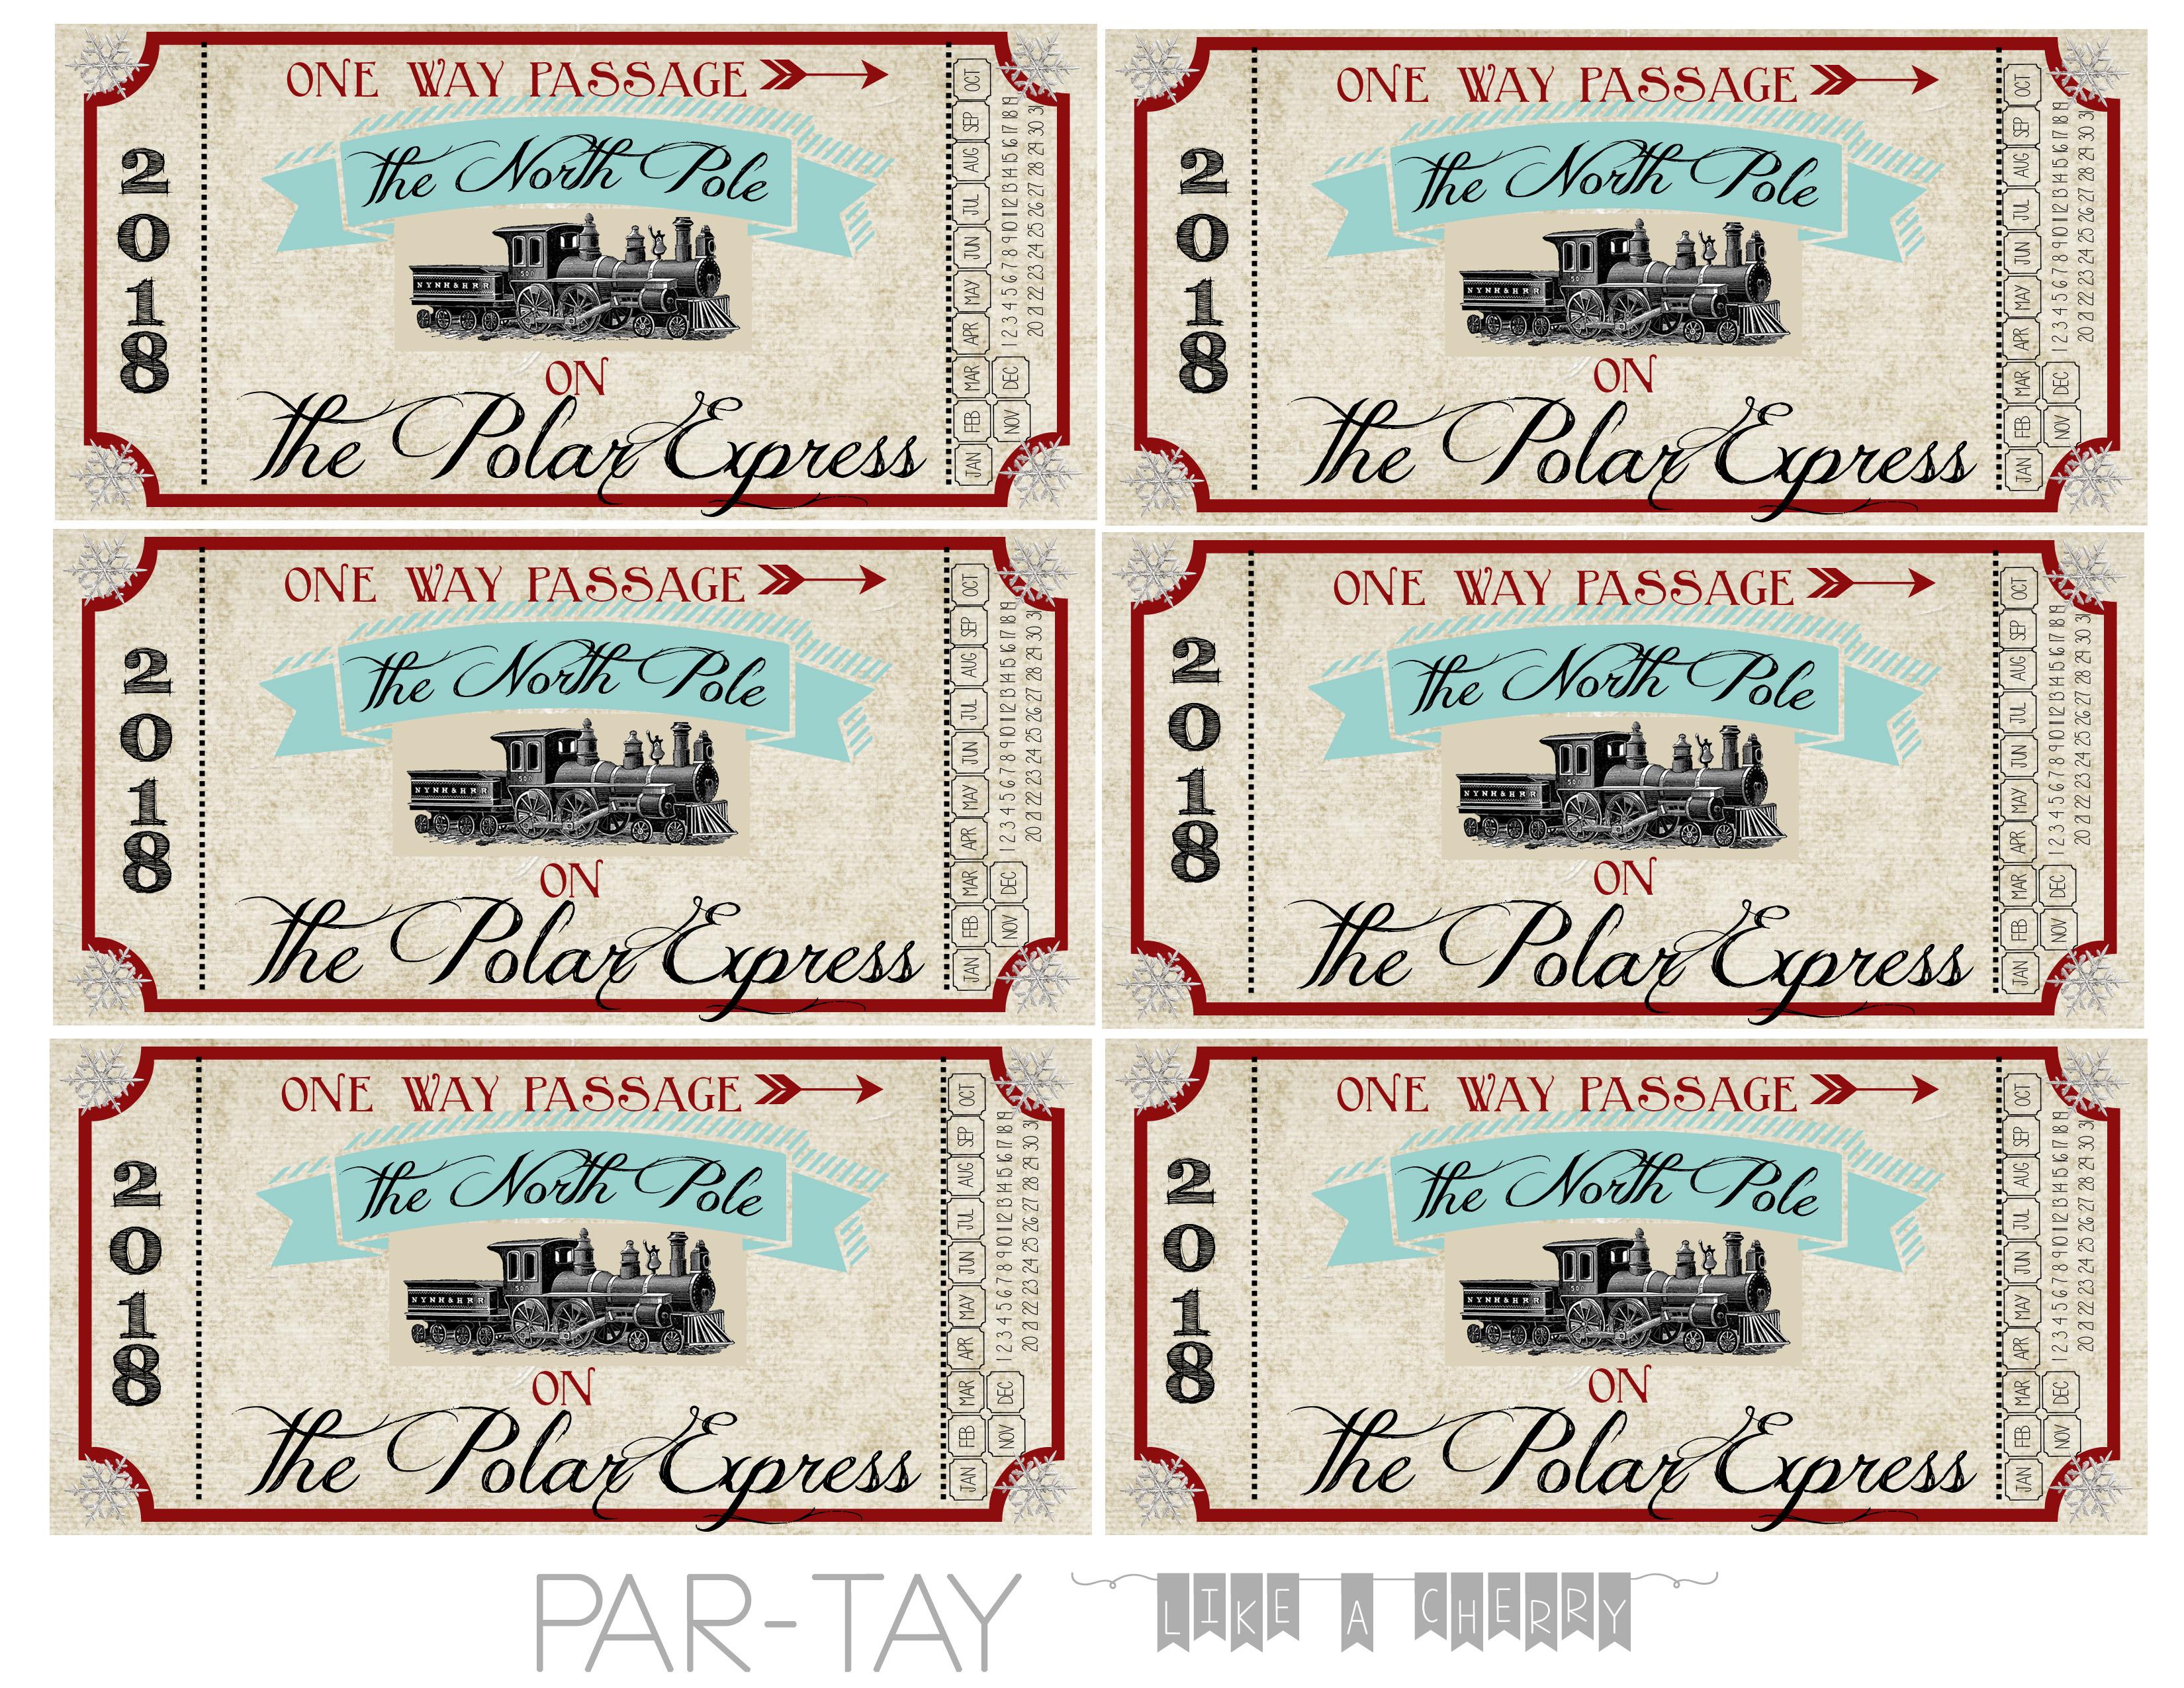 Polar Express Train Tickets Free Printable - Party Like A Cherry - Free Polar Express Printable Tickets